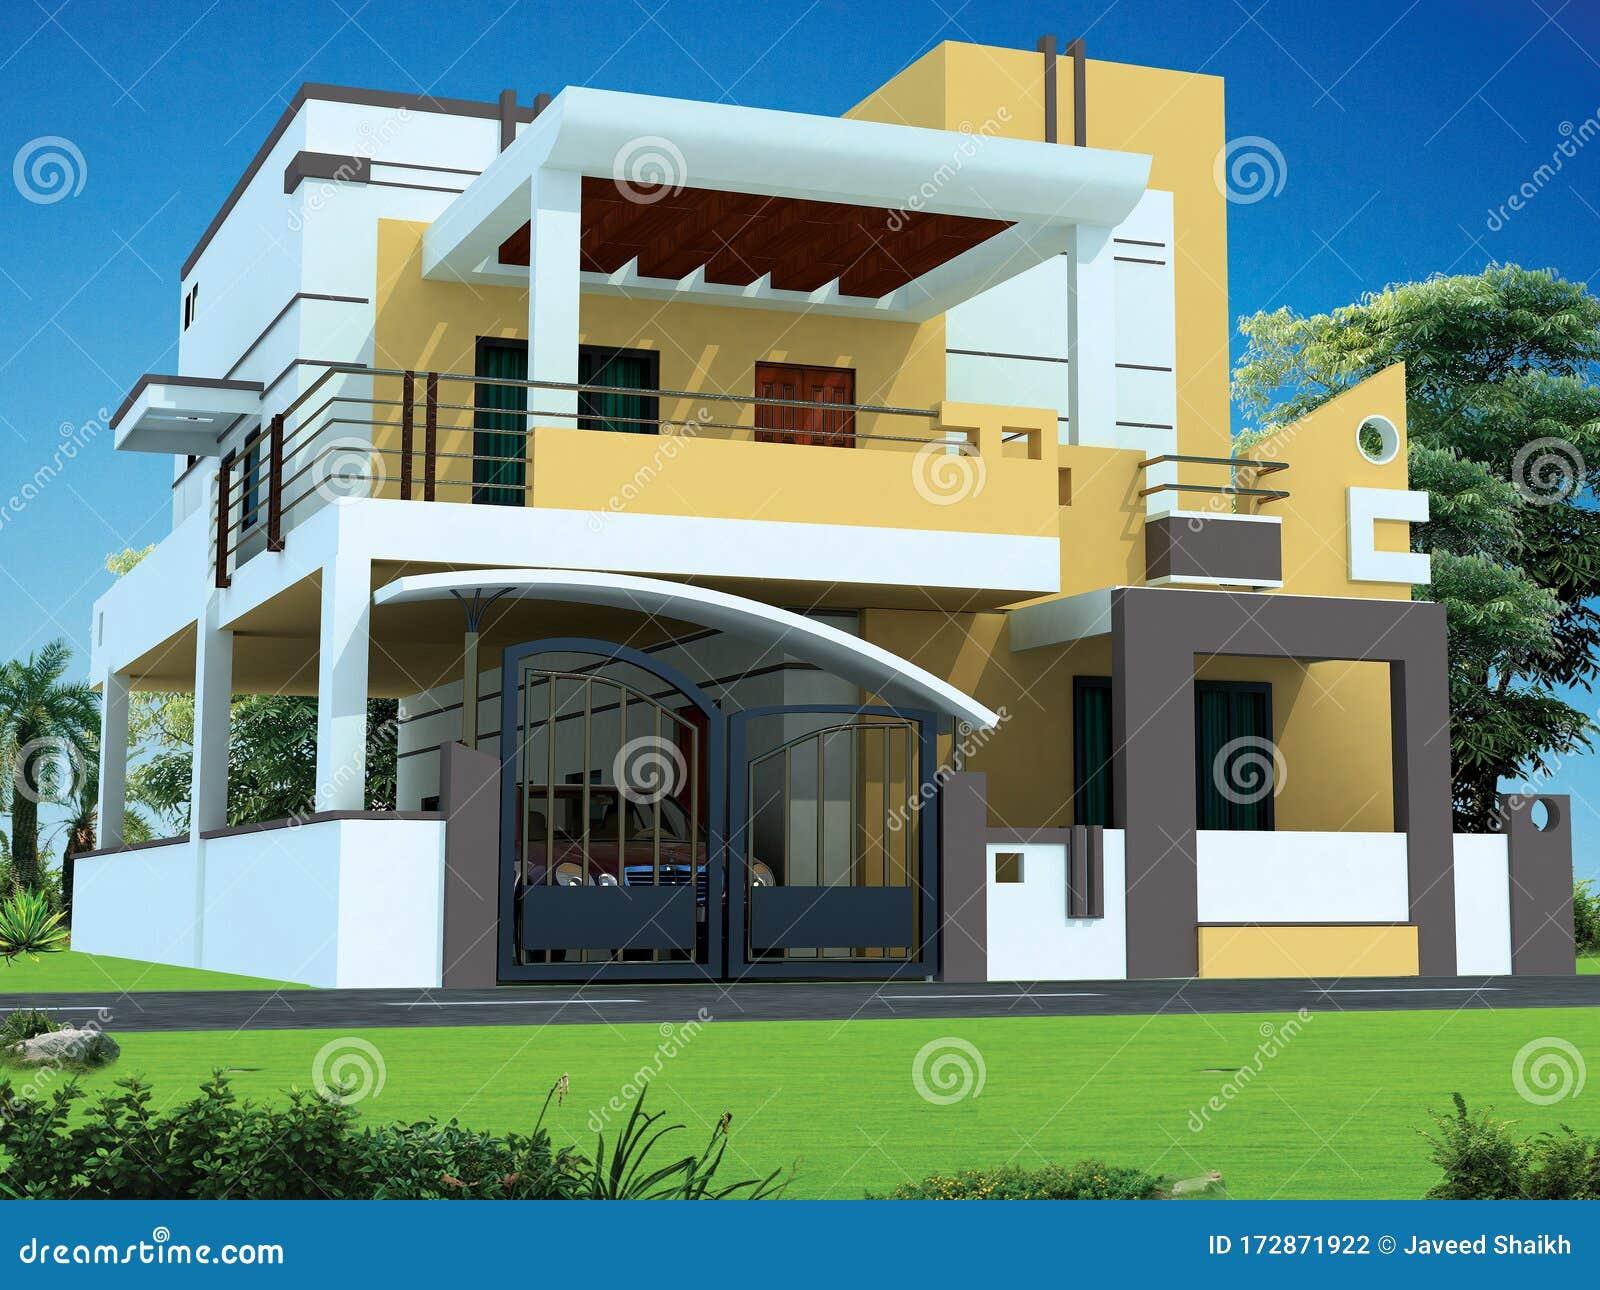 Best House Design Images Best House Images Latest House Images Design Stock Photo Image Of Beautiful Design 172871922